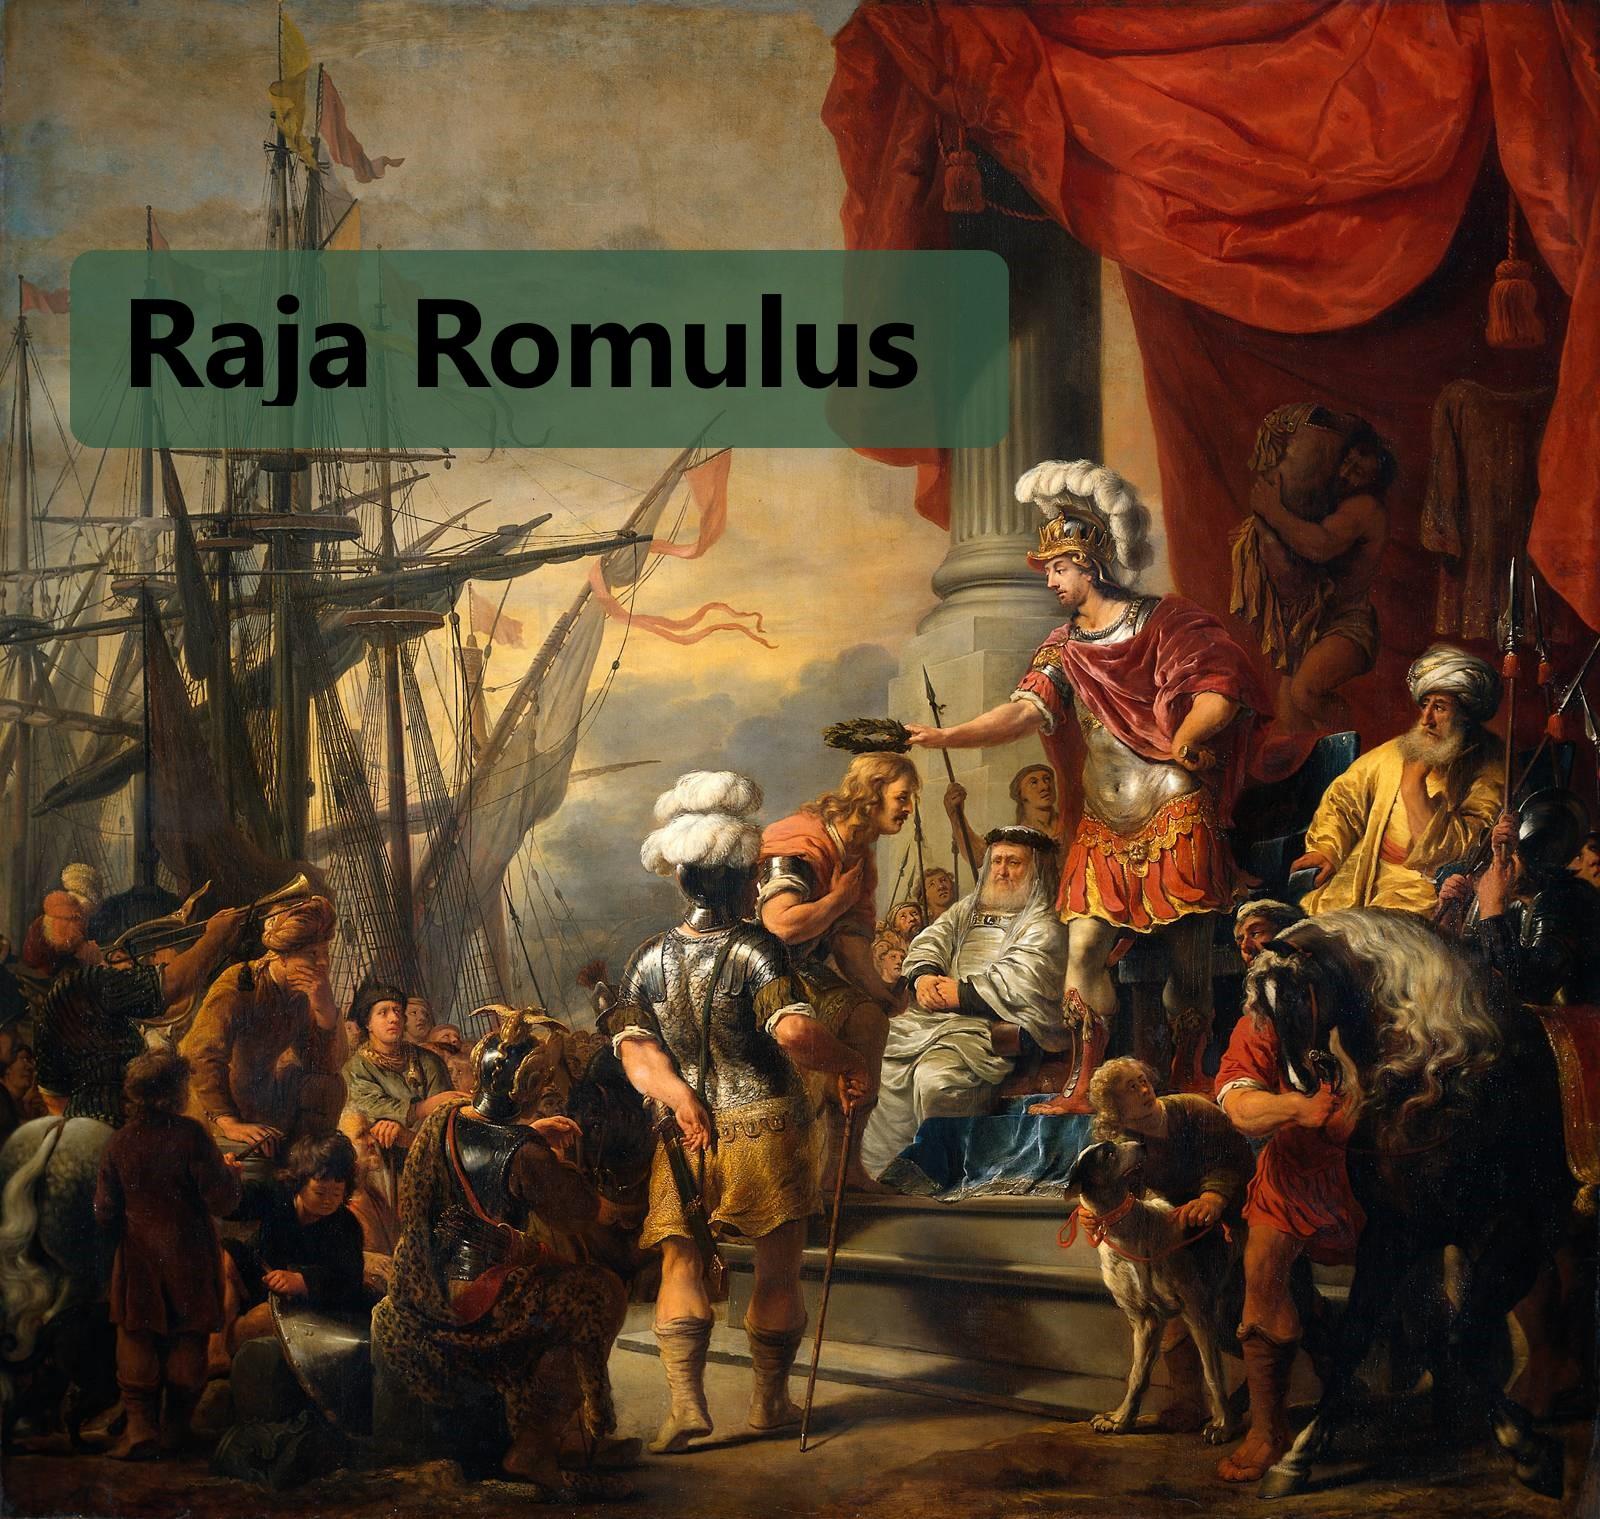 Raja Romulus